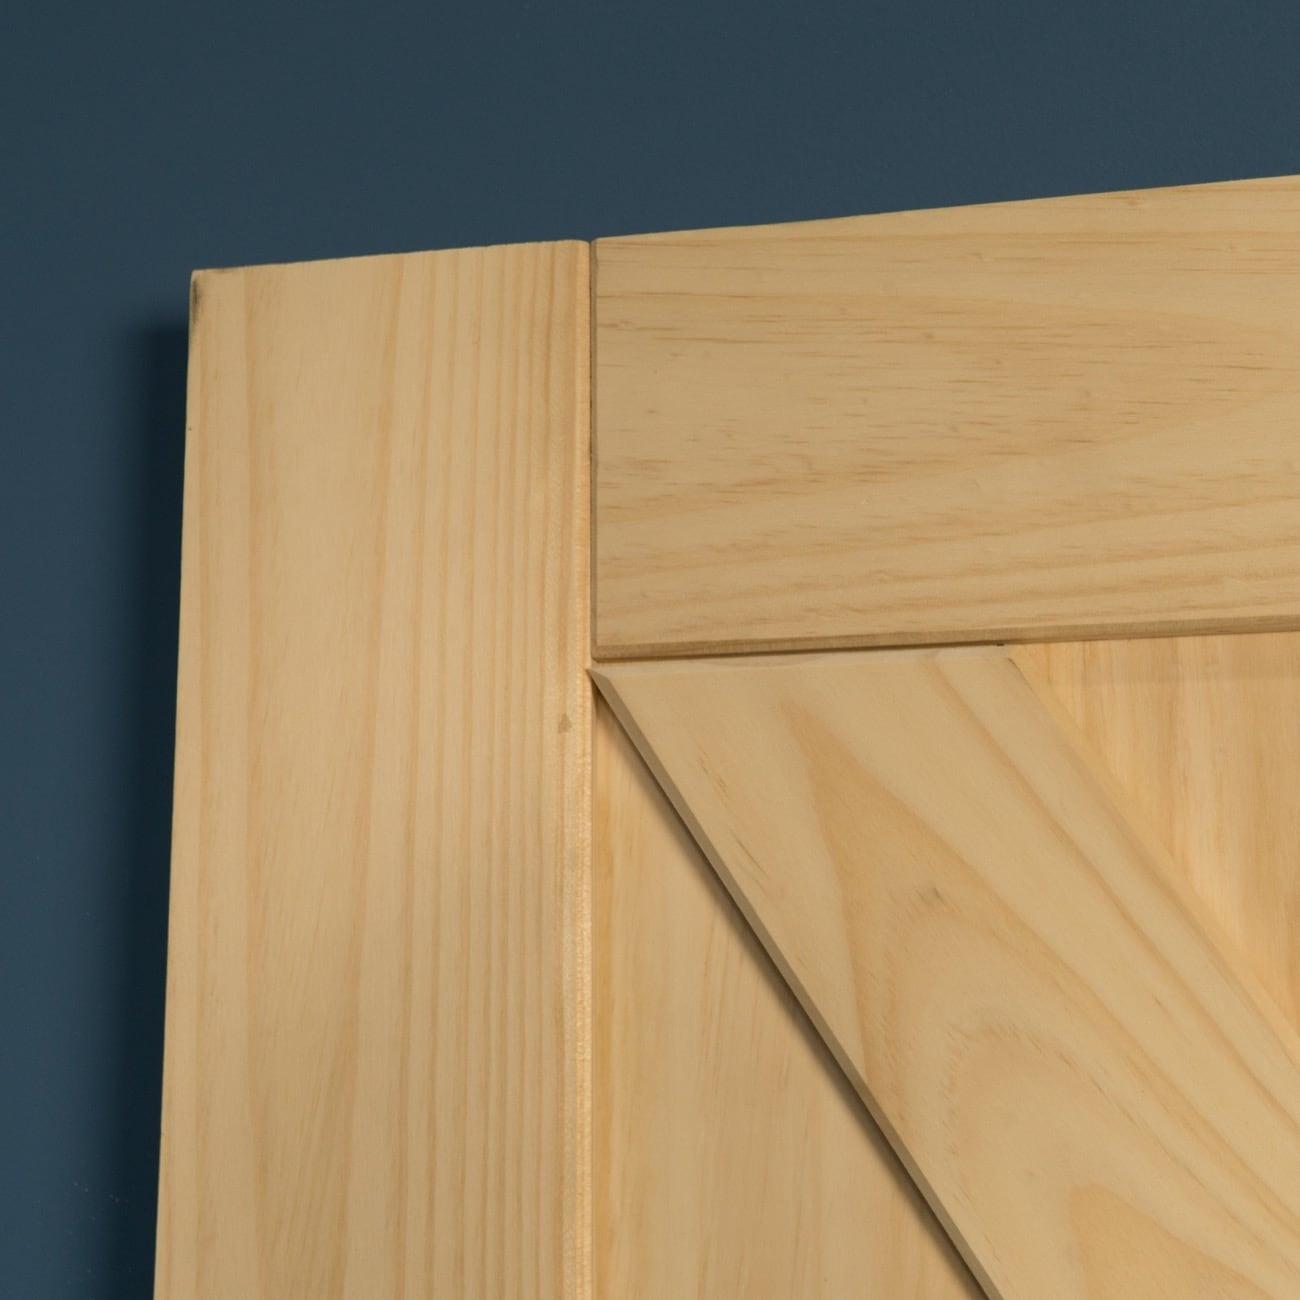 Belleze 42 X 84 Inches Natural Wood Pine Unfinished Diy Sliding Barn Door Arrow